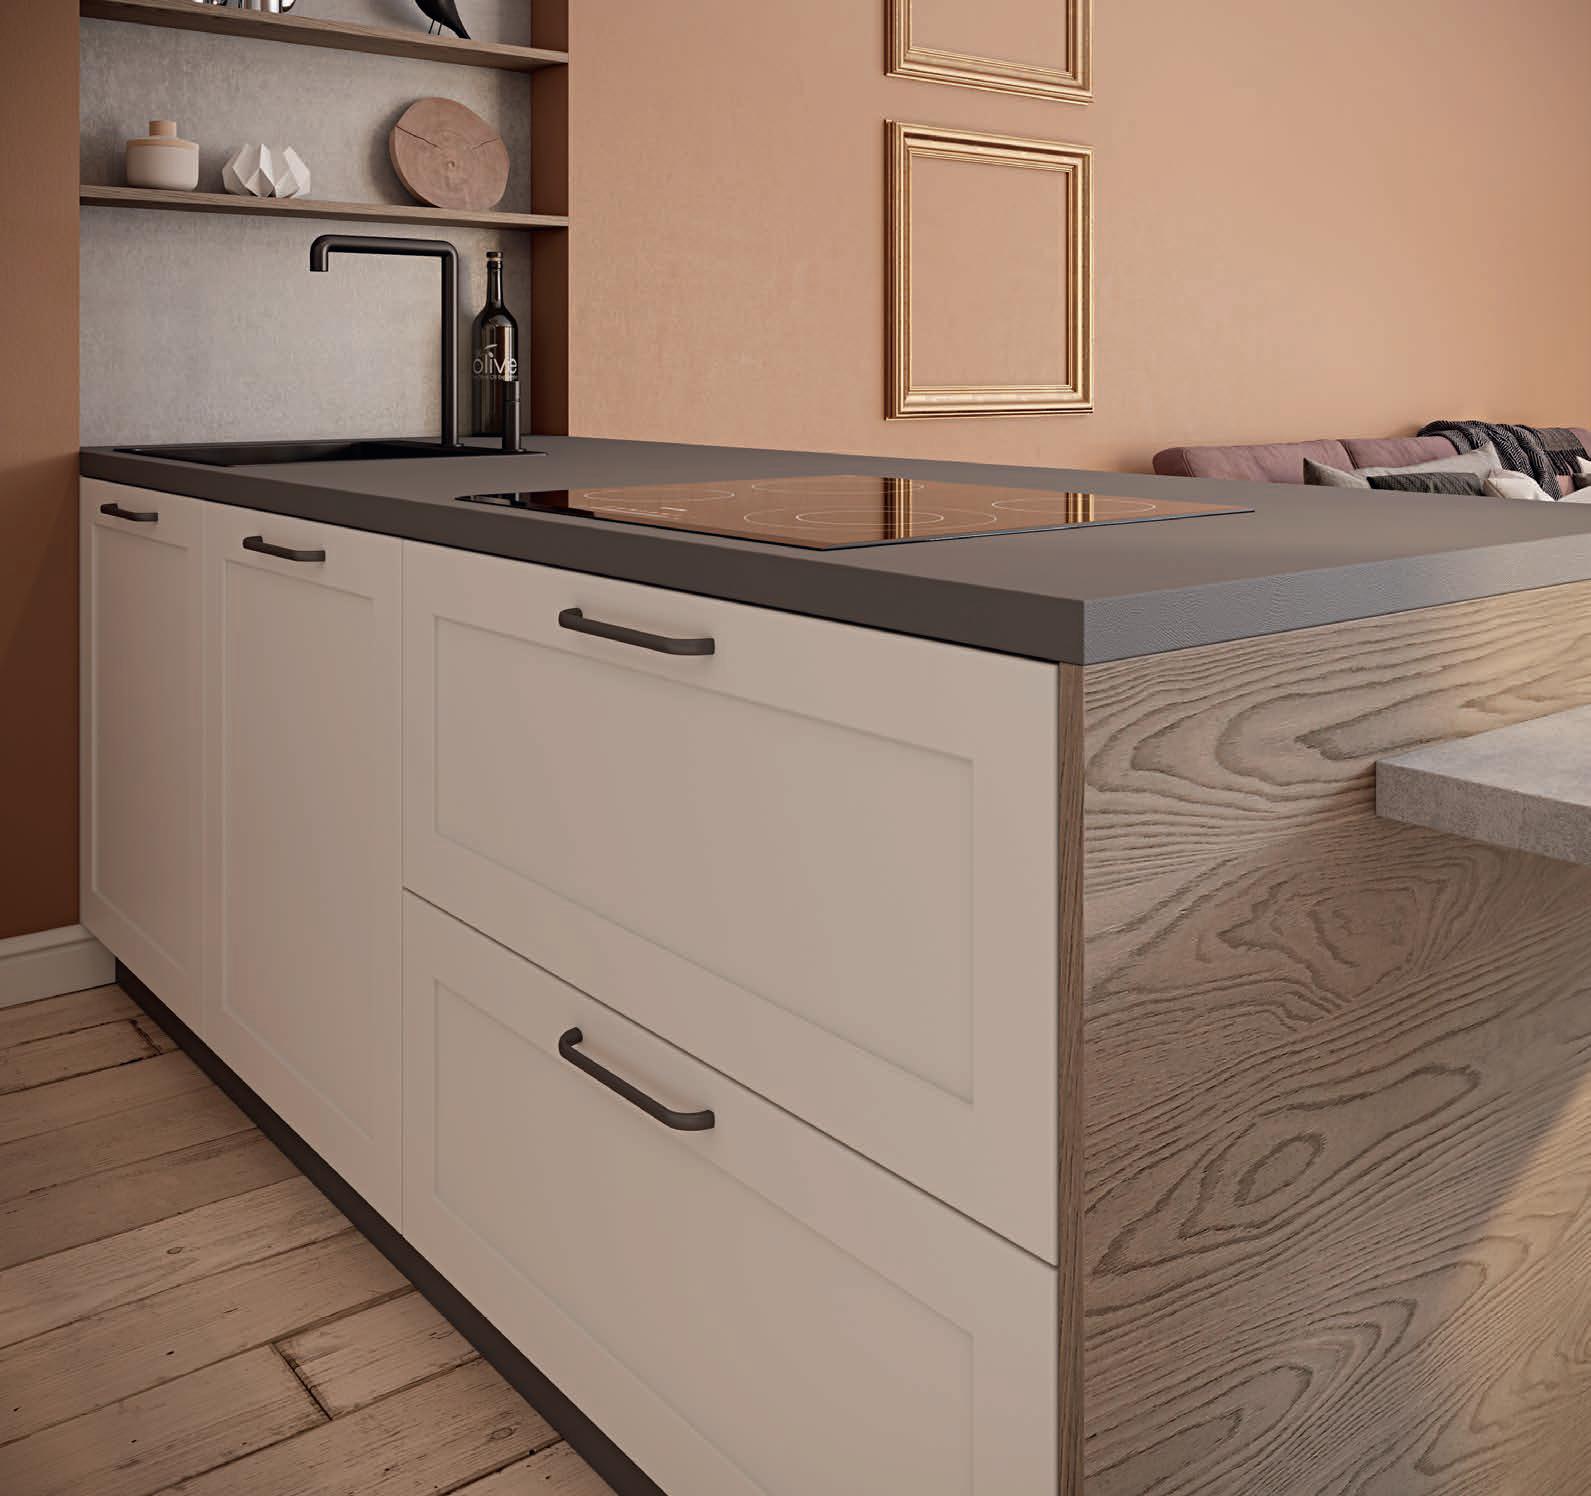 Pin By Zov Kuchnie On Kuchnie Nowoczesne Home Decor Kitchen Decor